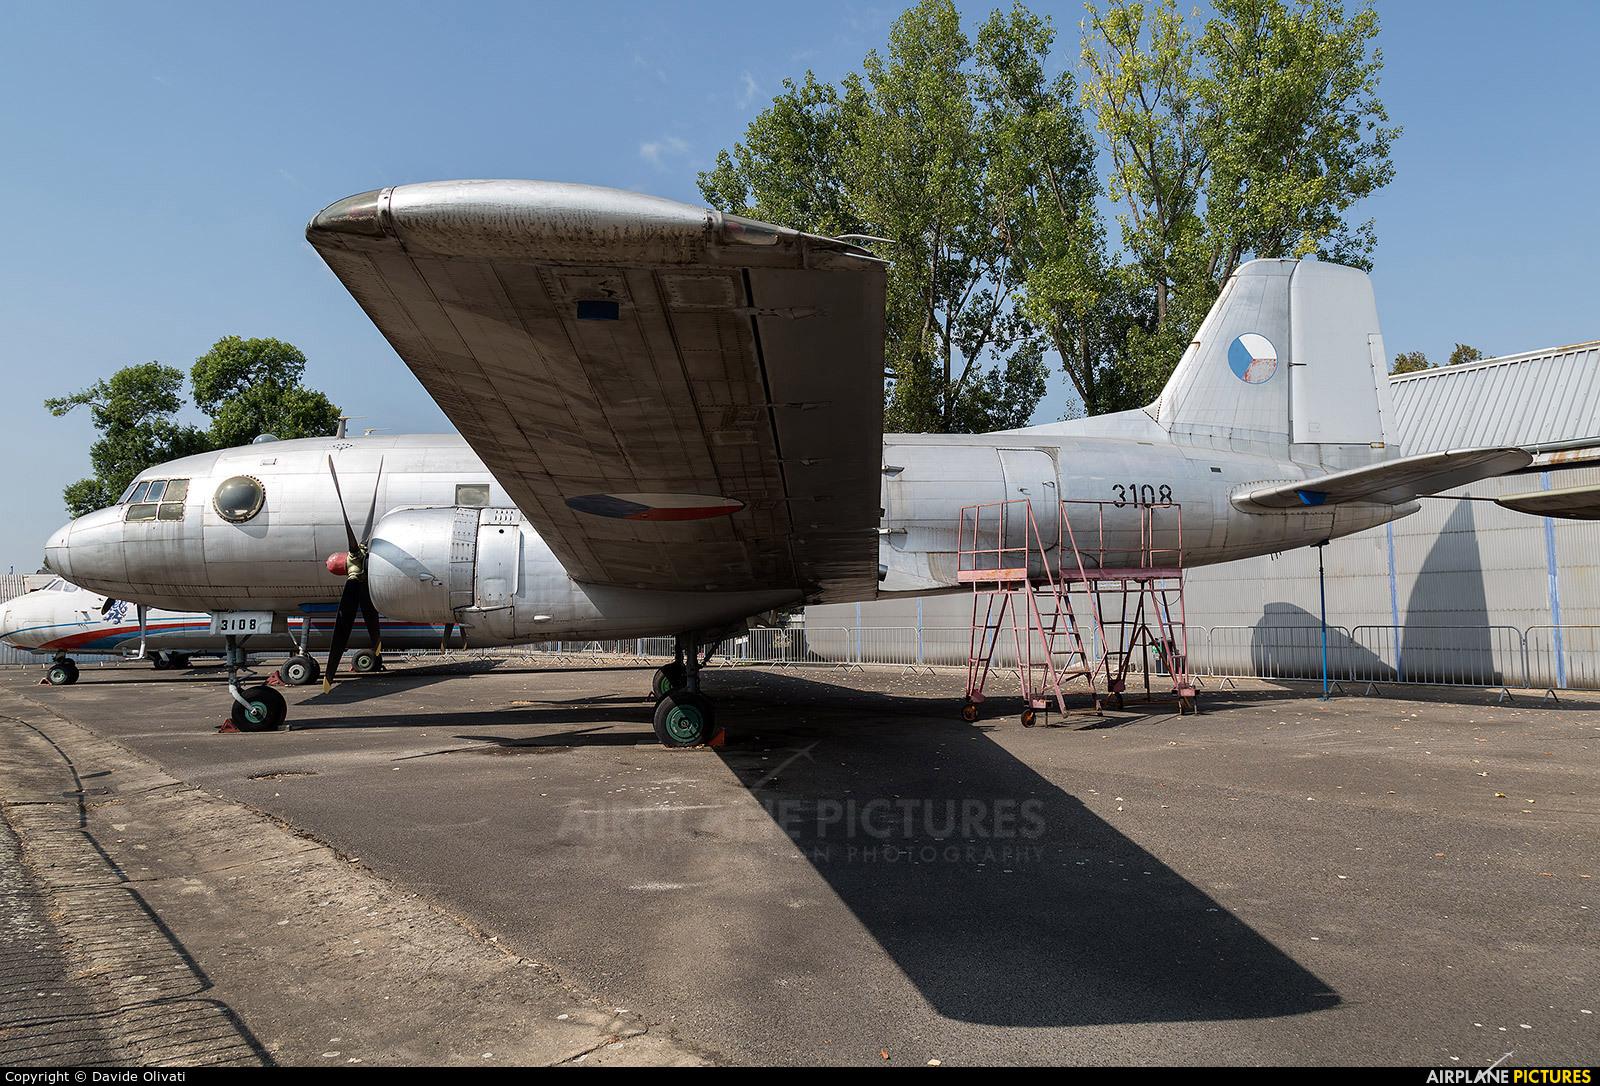 Czechoslovak - Air Force 3108 aircraft at Prague - Kbely, Letecké muzeum